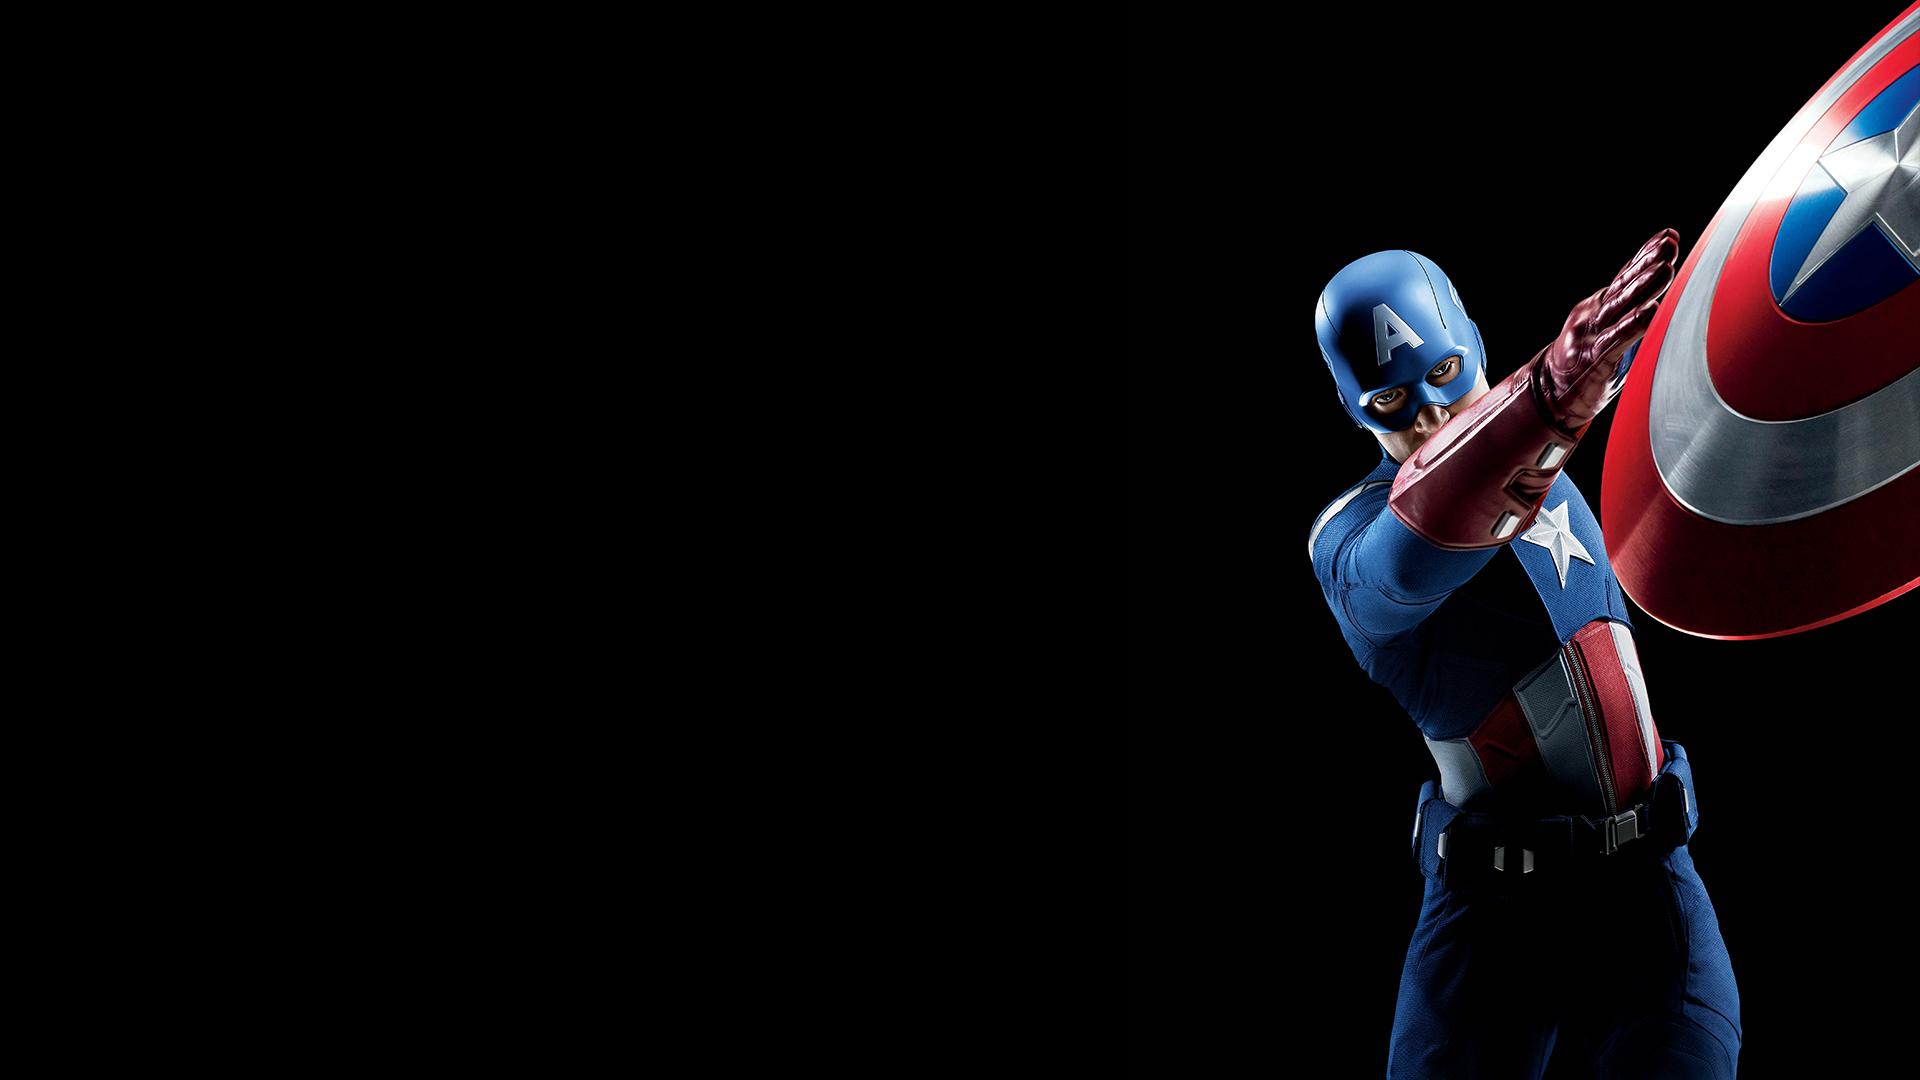 MARVELS THE AVENGERS superhero america wallpaper 1920x1080 102267 1920x1080